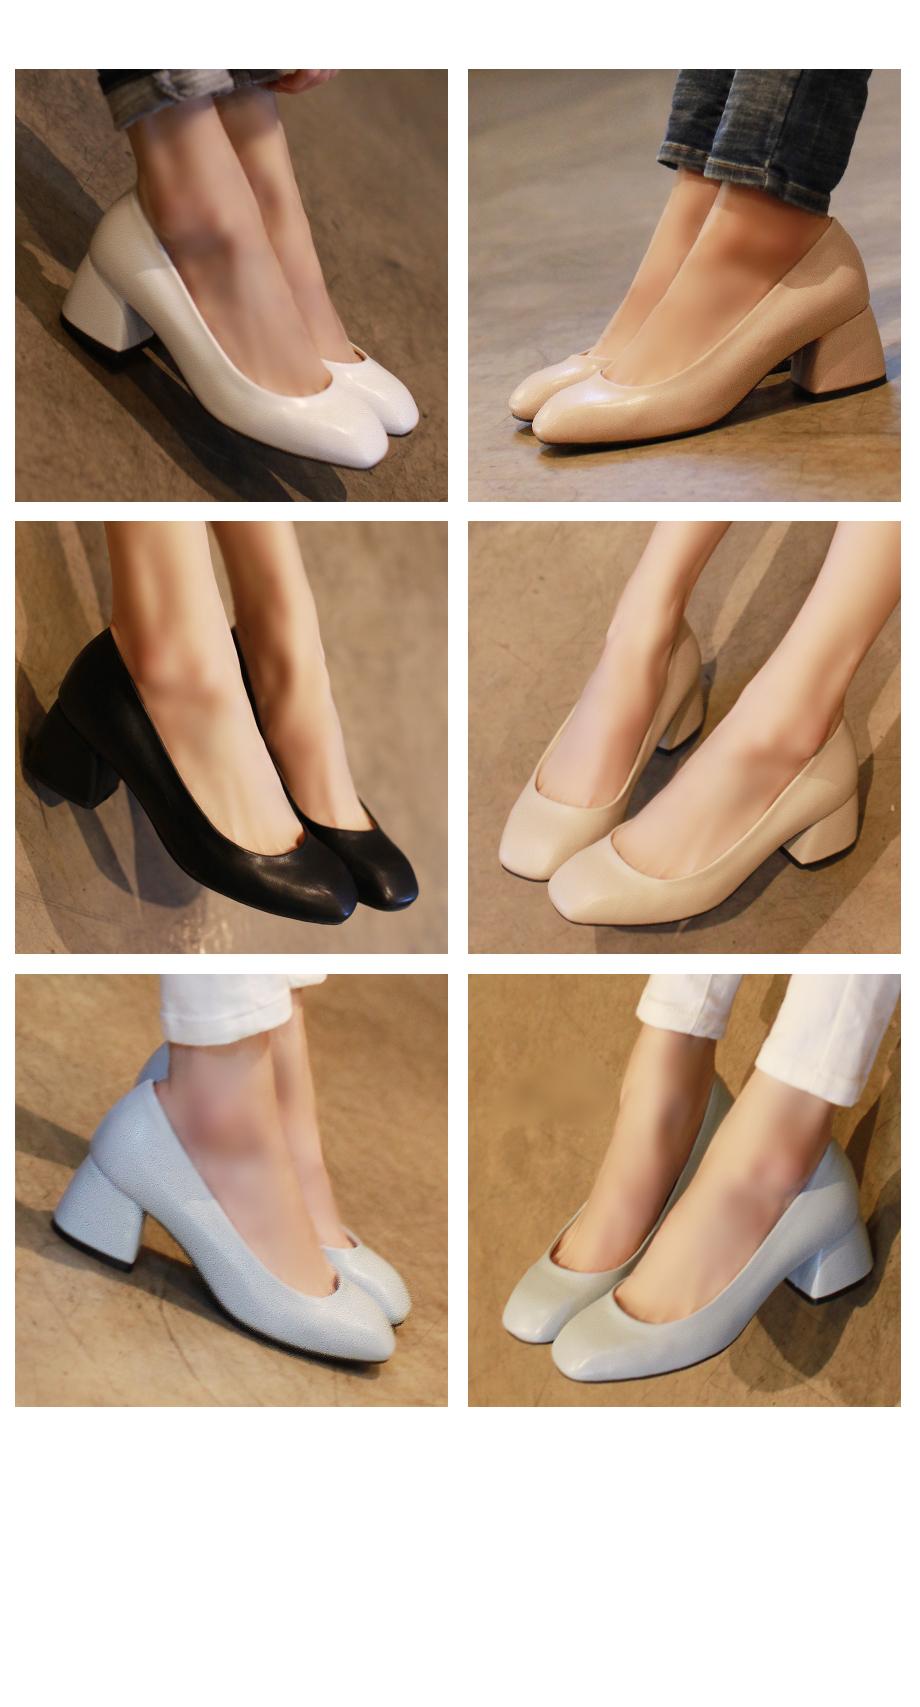 Chandila mid-heel pumps 5cm